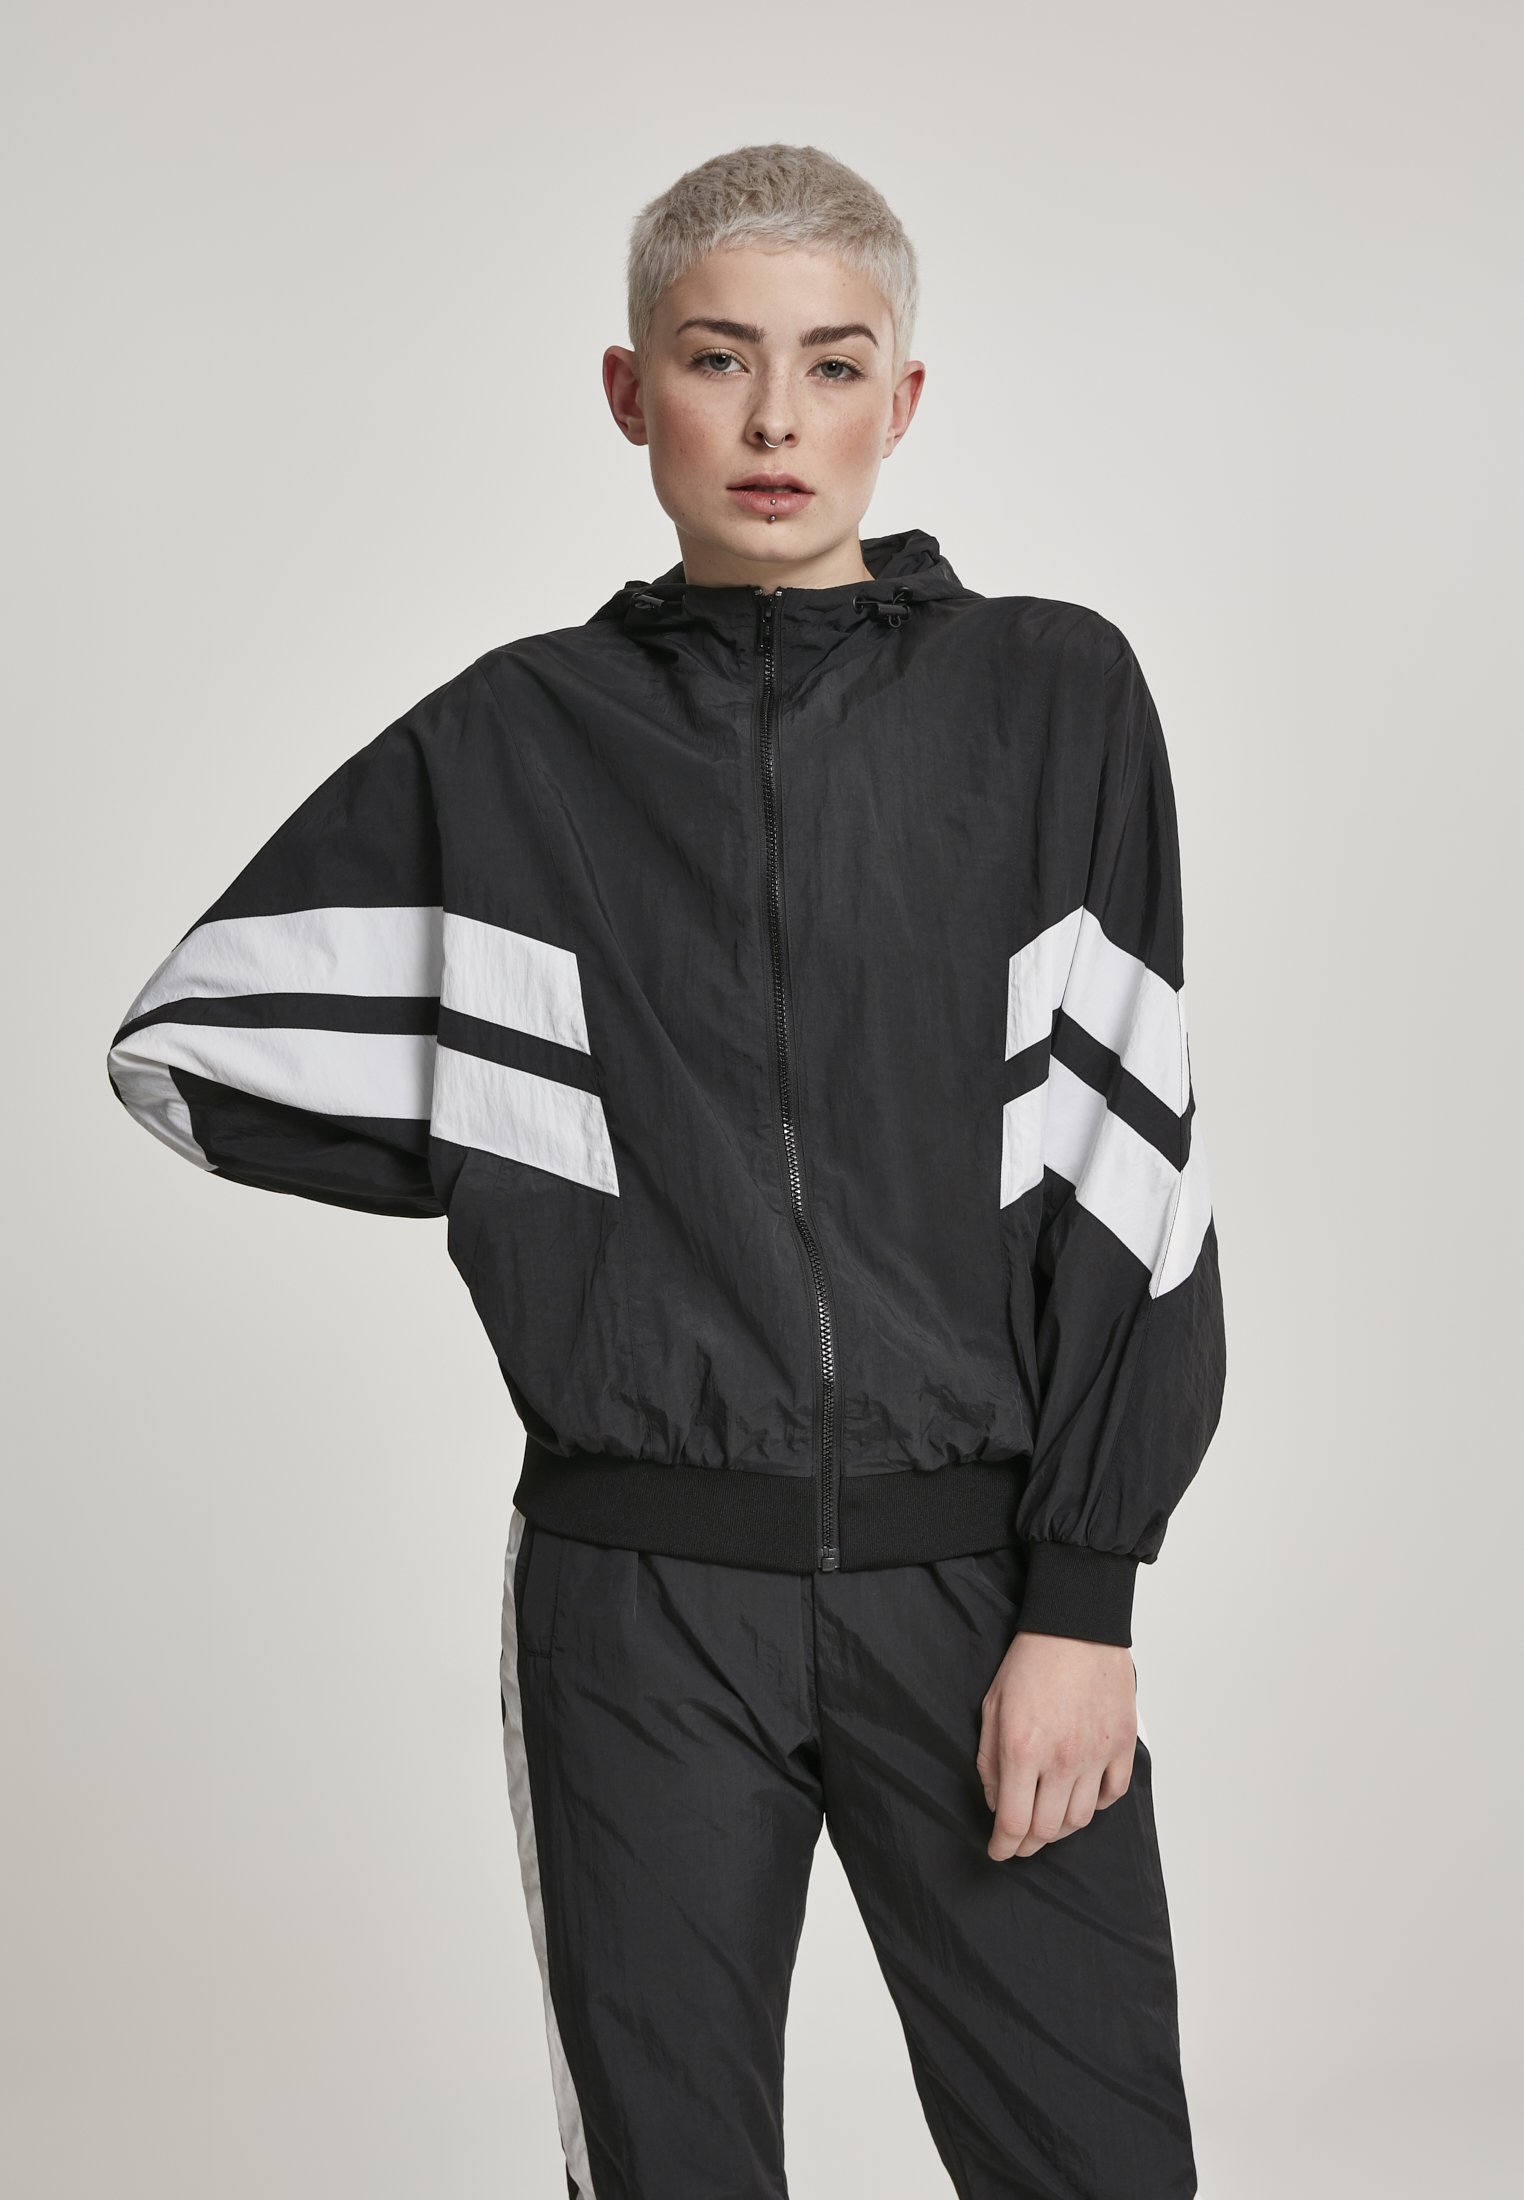 Urban Classics Damen Jacke Ladies Crinkle Batwing Jacket